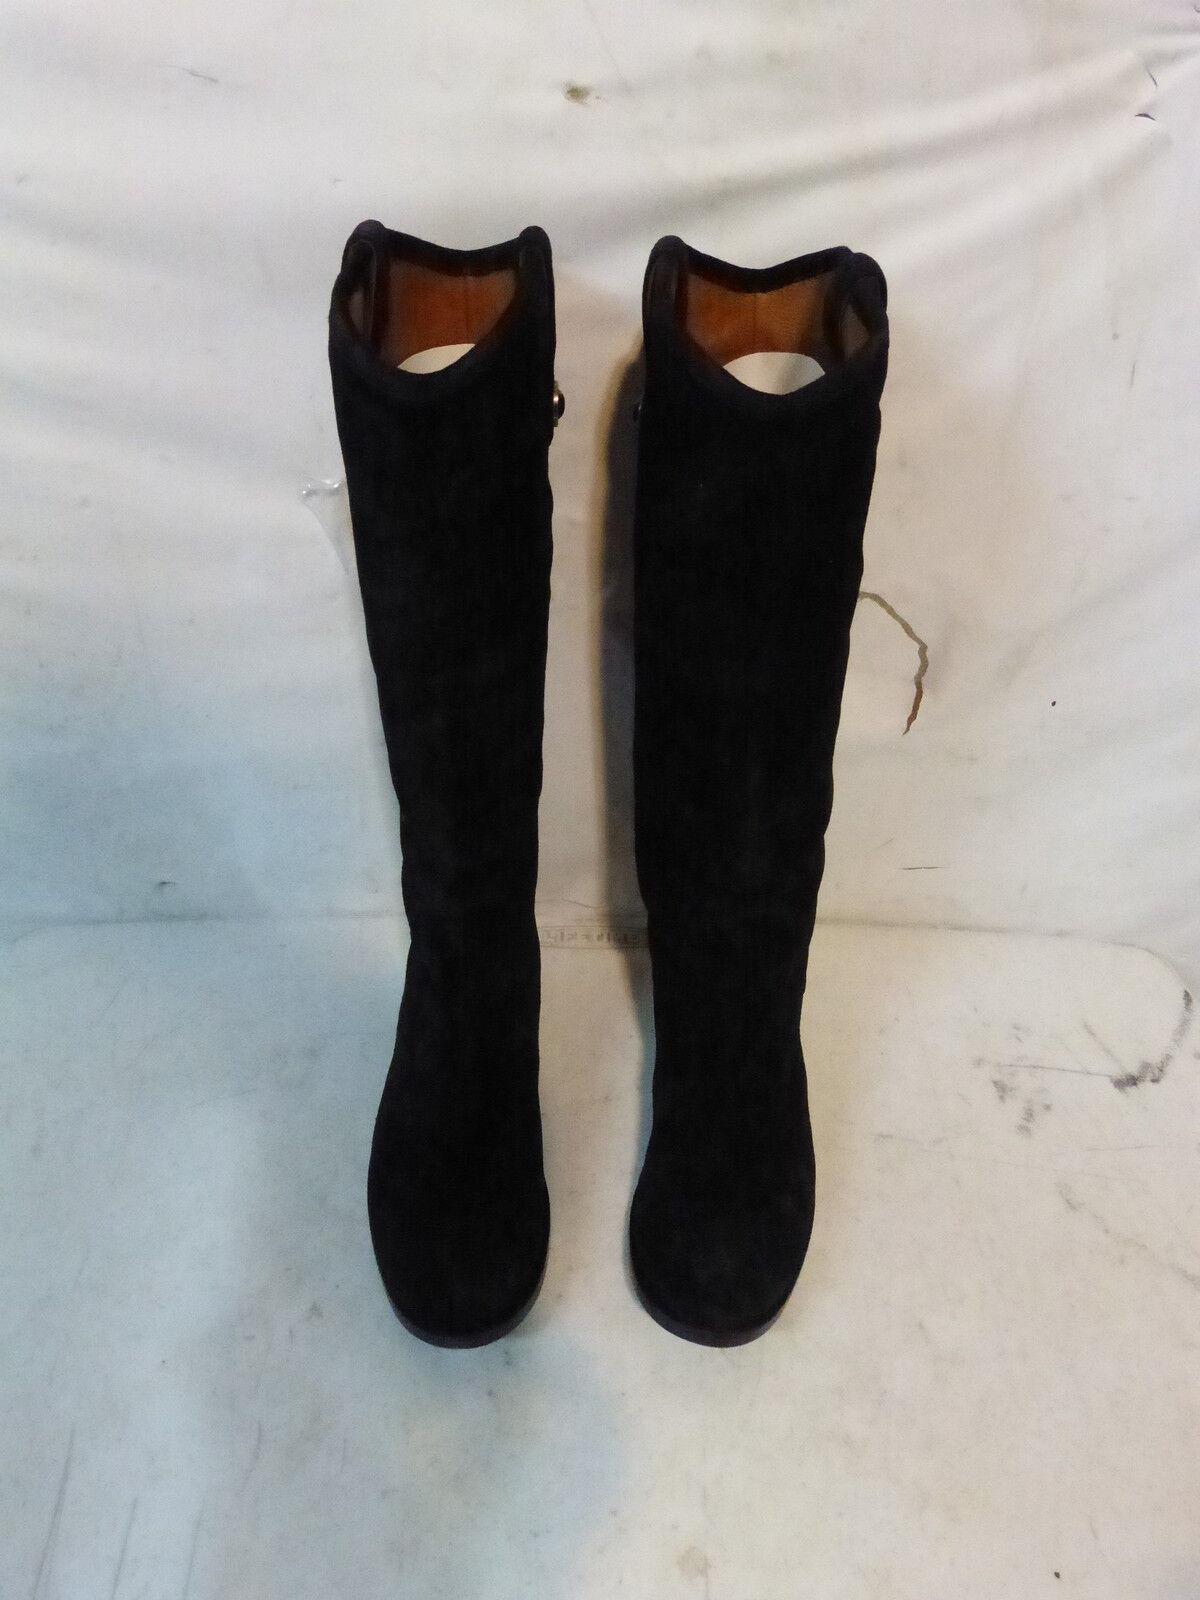 Frye Melissa Button Boot - Women's 8.0 Black Retail  367.95